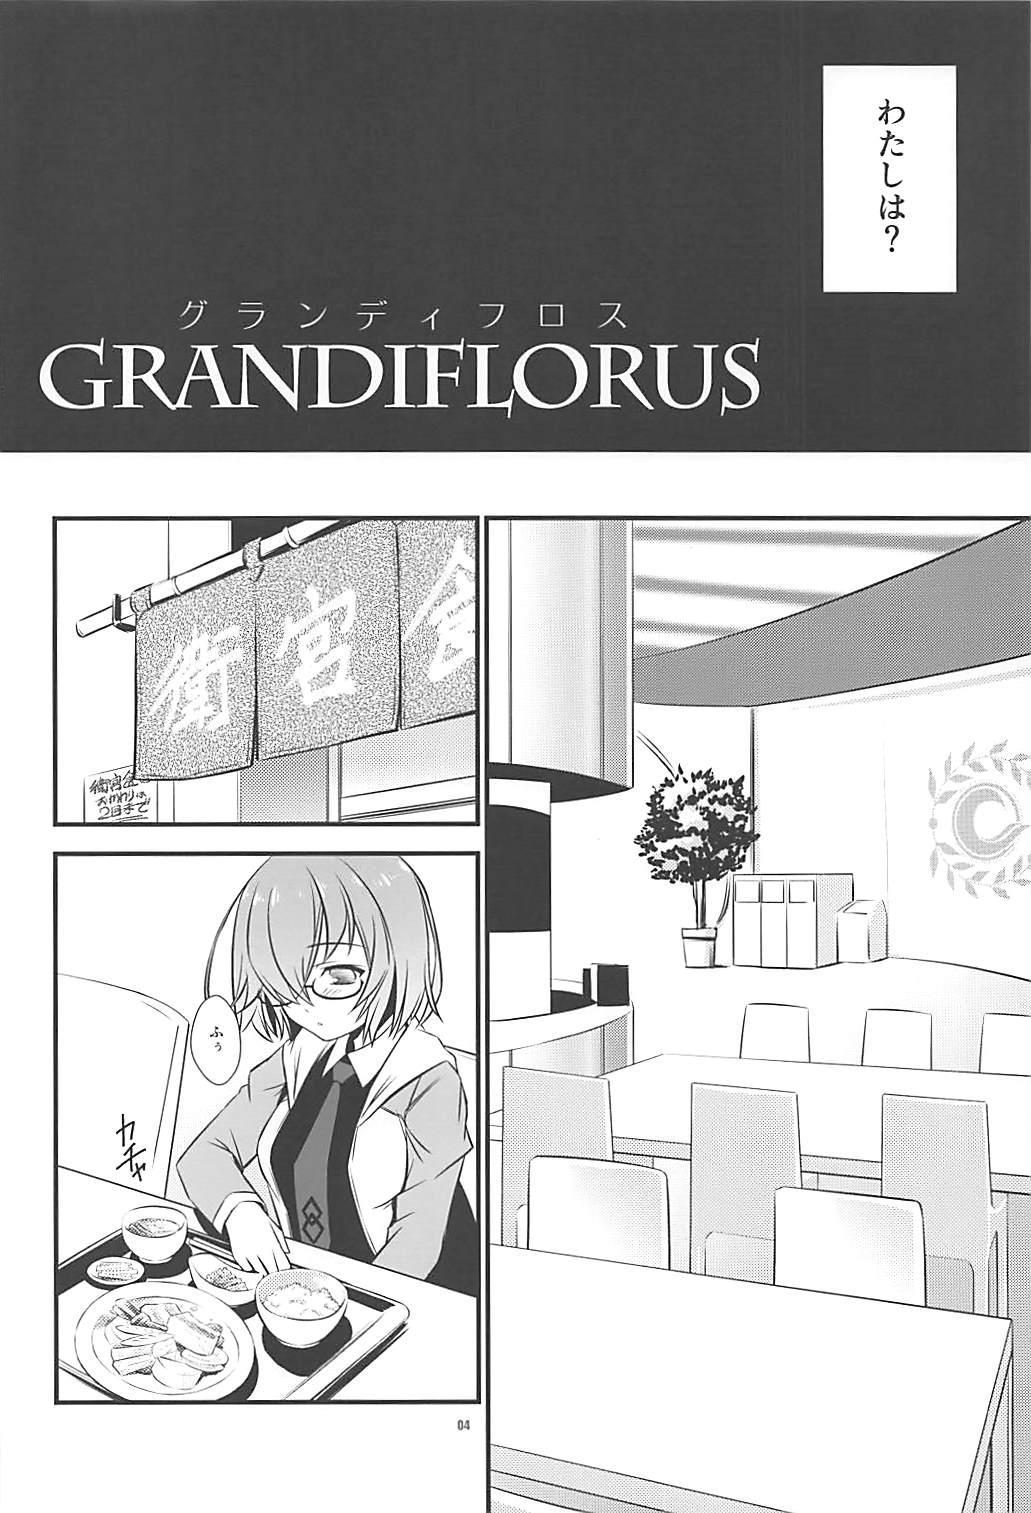 GRANDIFLORUS 2